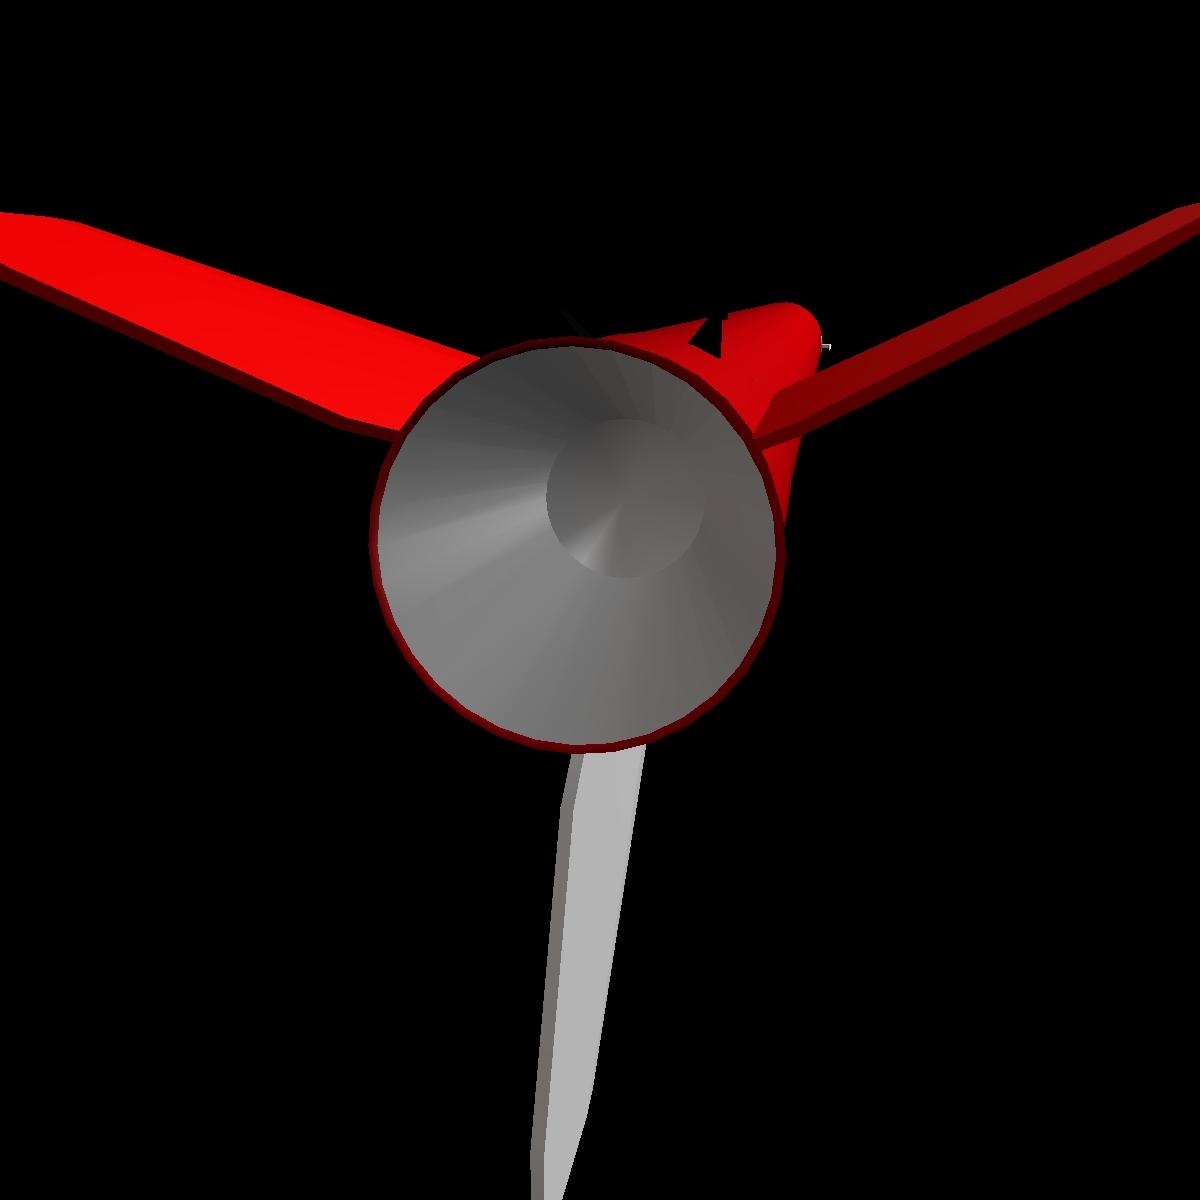 хар хун III пуужин 3d загвар 3ds дууг сонсогдож dxf cob x obj 150825